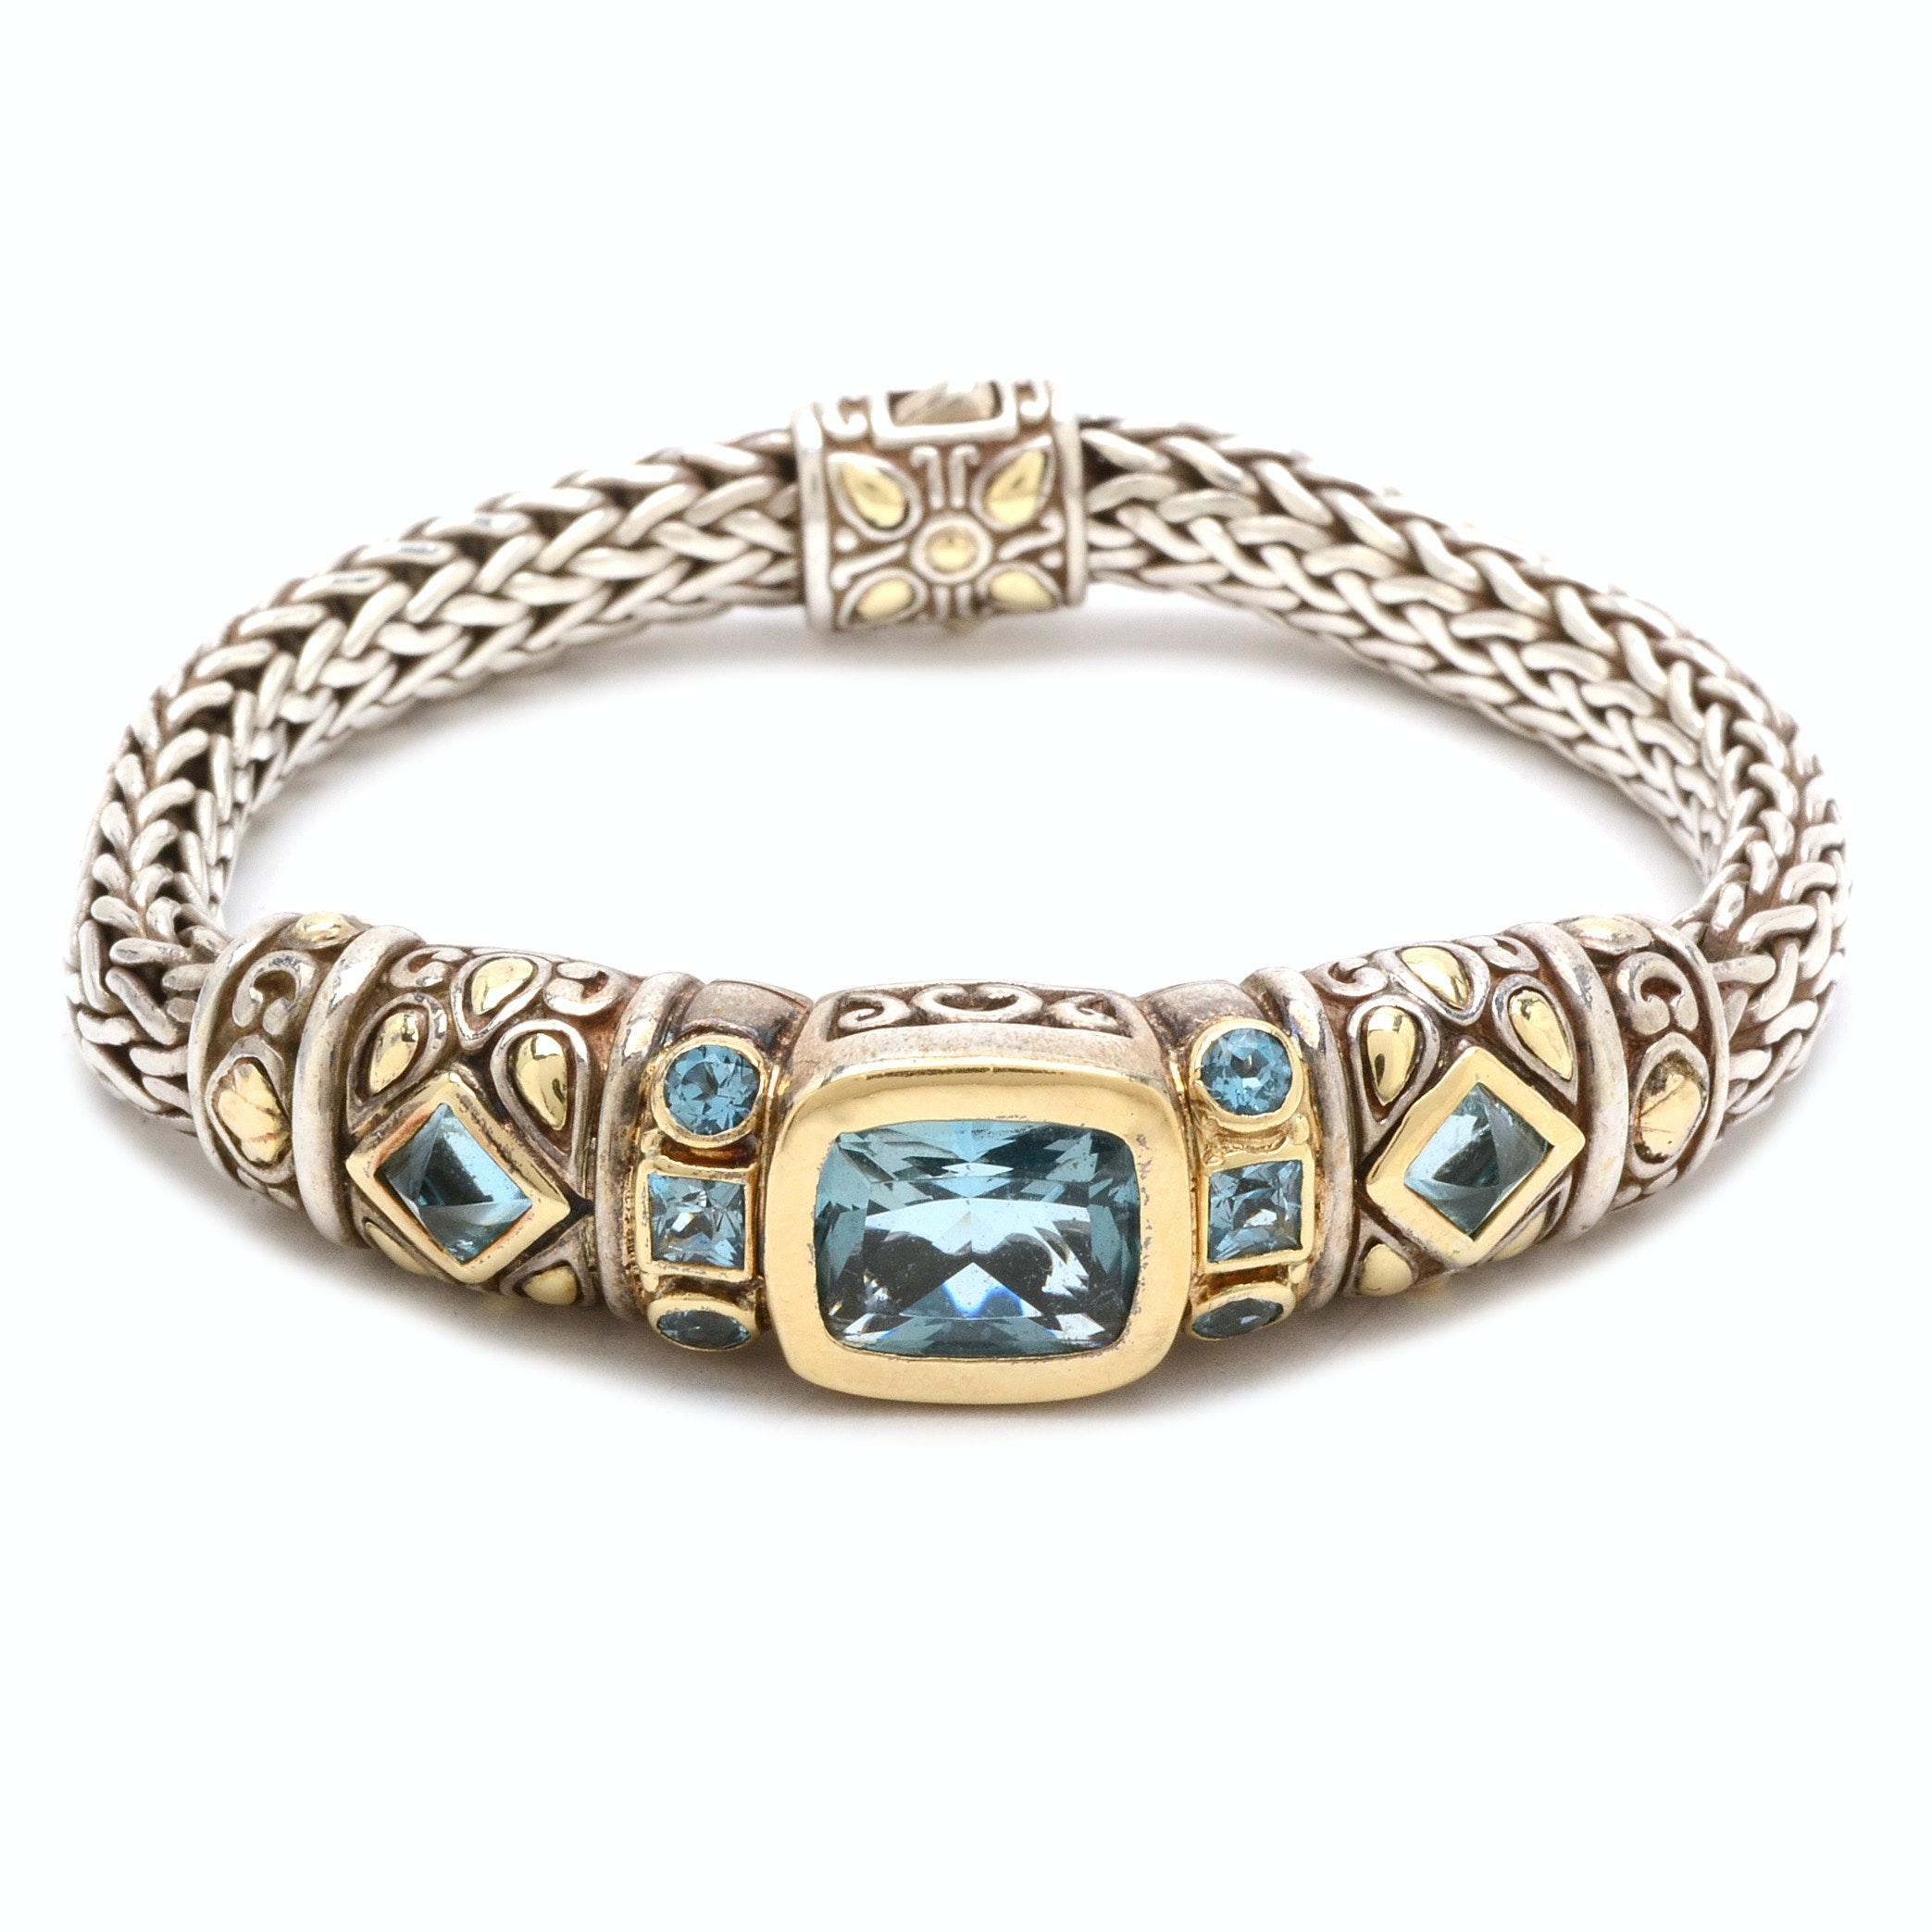 John Hardy Sterling Silver and 18K Yellow Gold Blue Topaz Bracelet